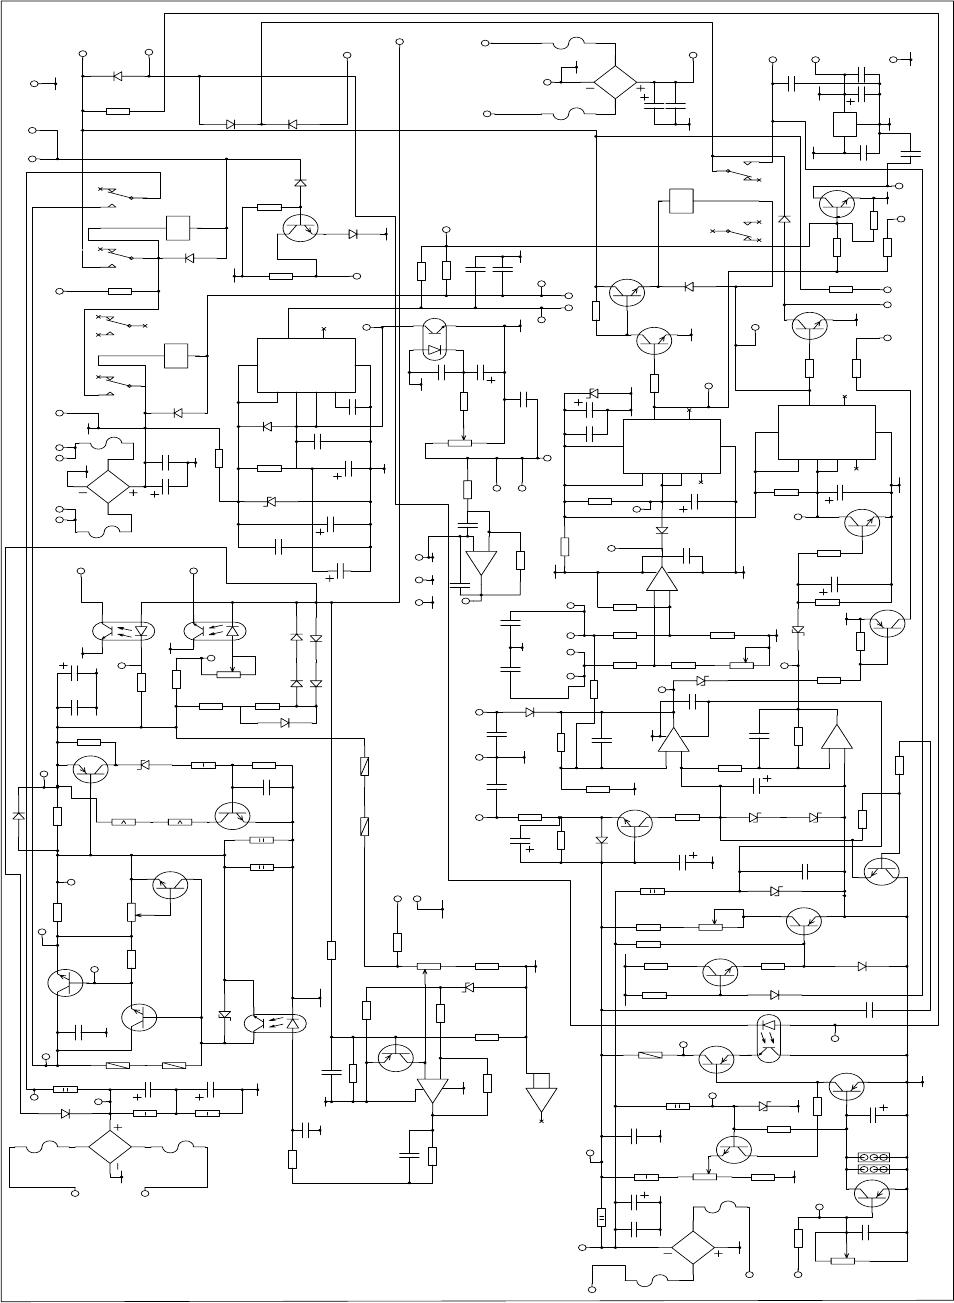 Emtron North America DX-2 HF Amature User Manual 308274